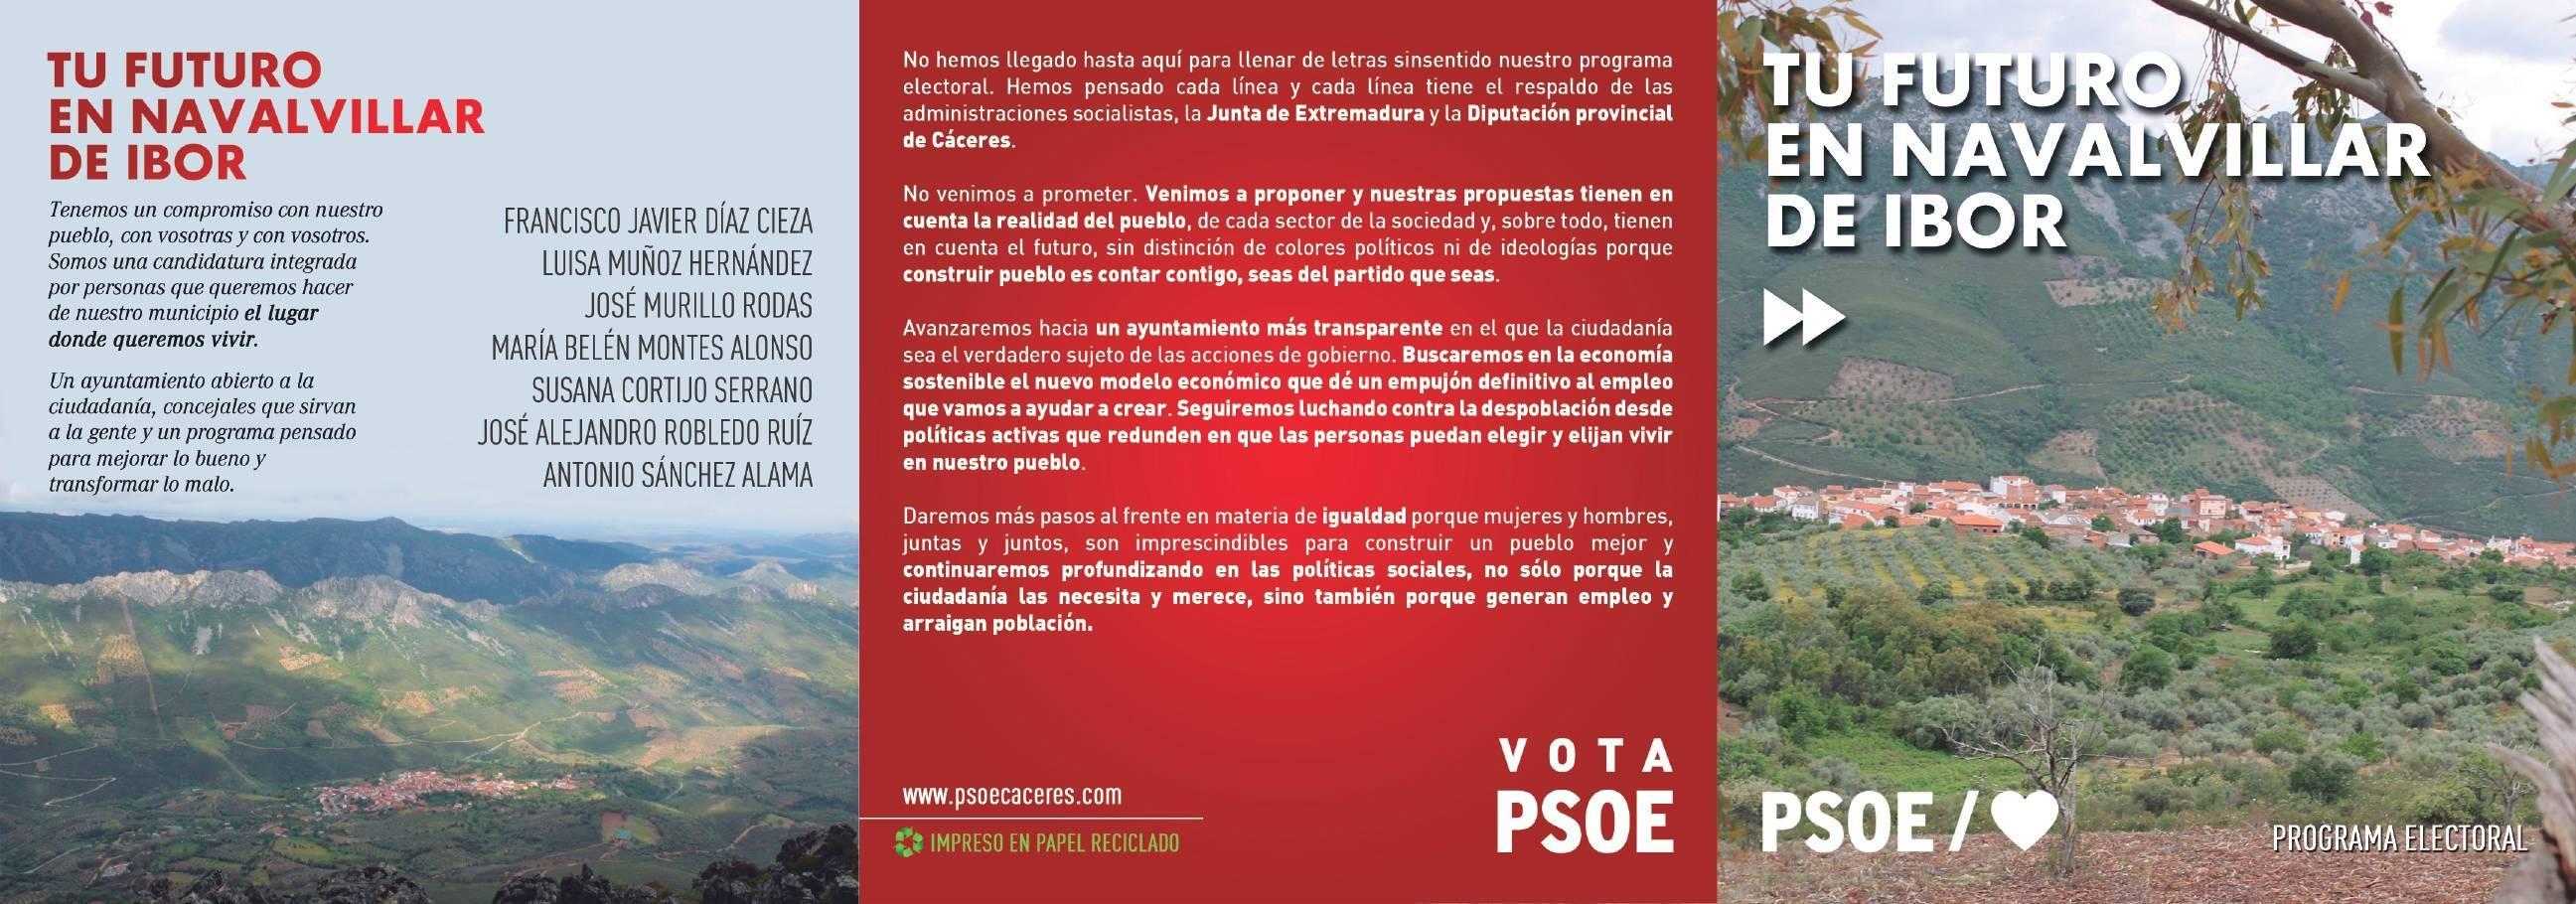 Programa electoral PSOE 2019 - Navalvillar de Ibor (Cáceres) 1